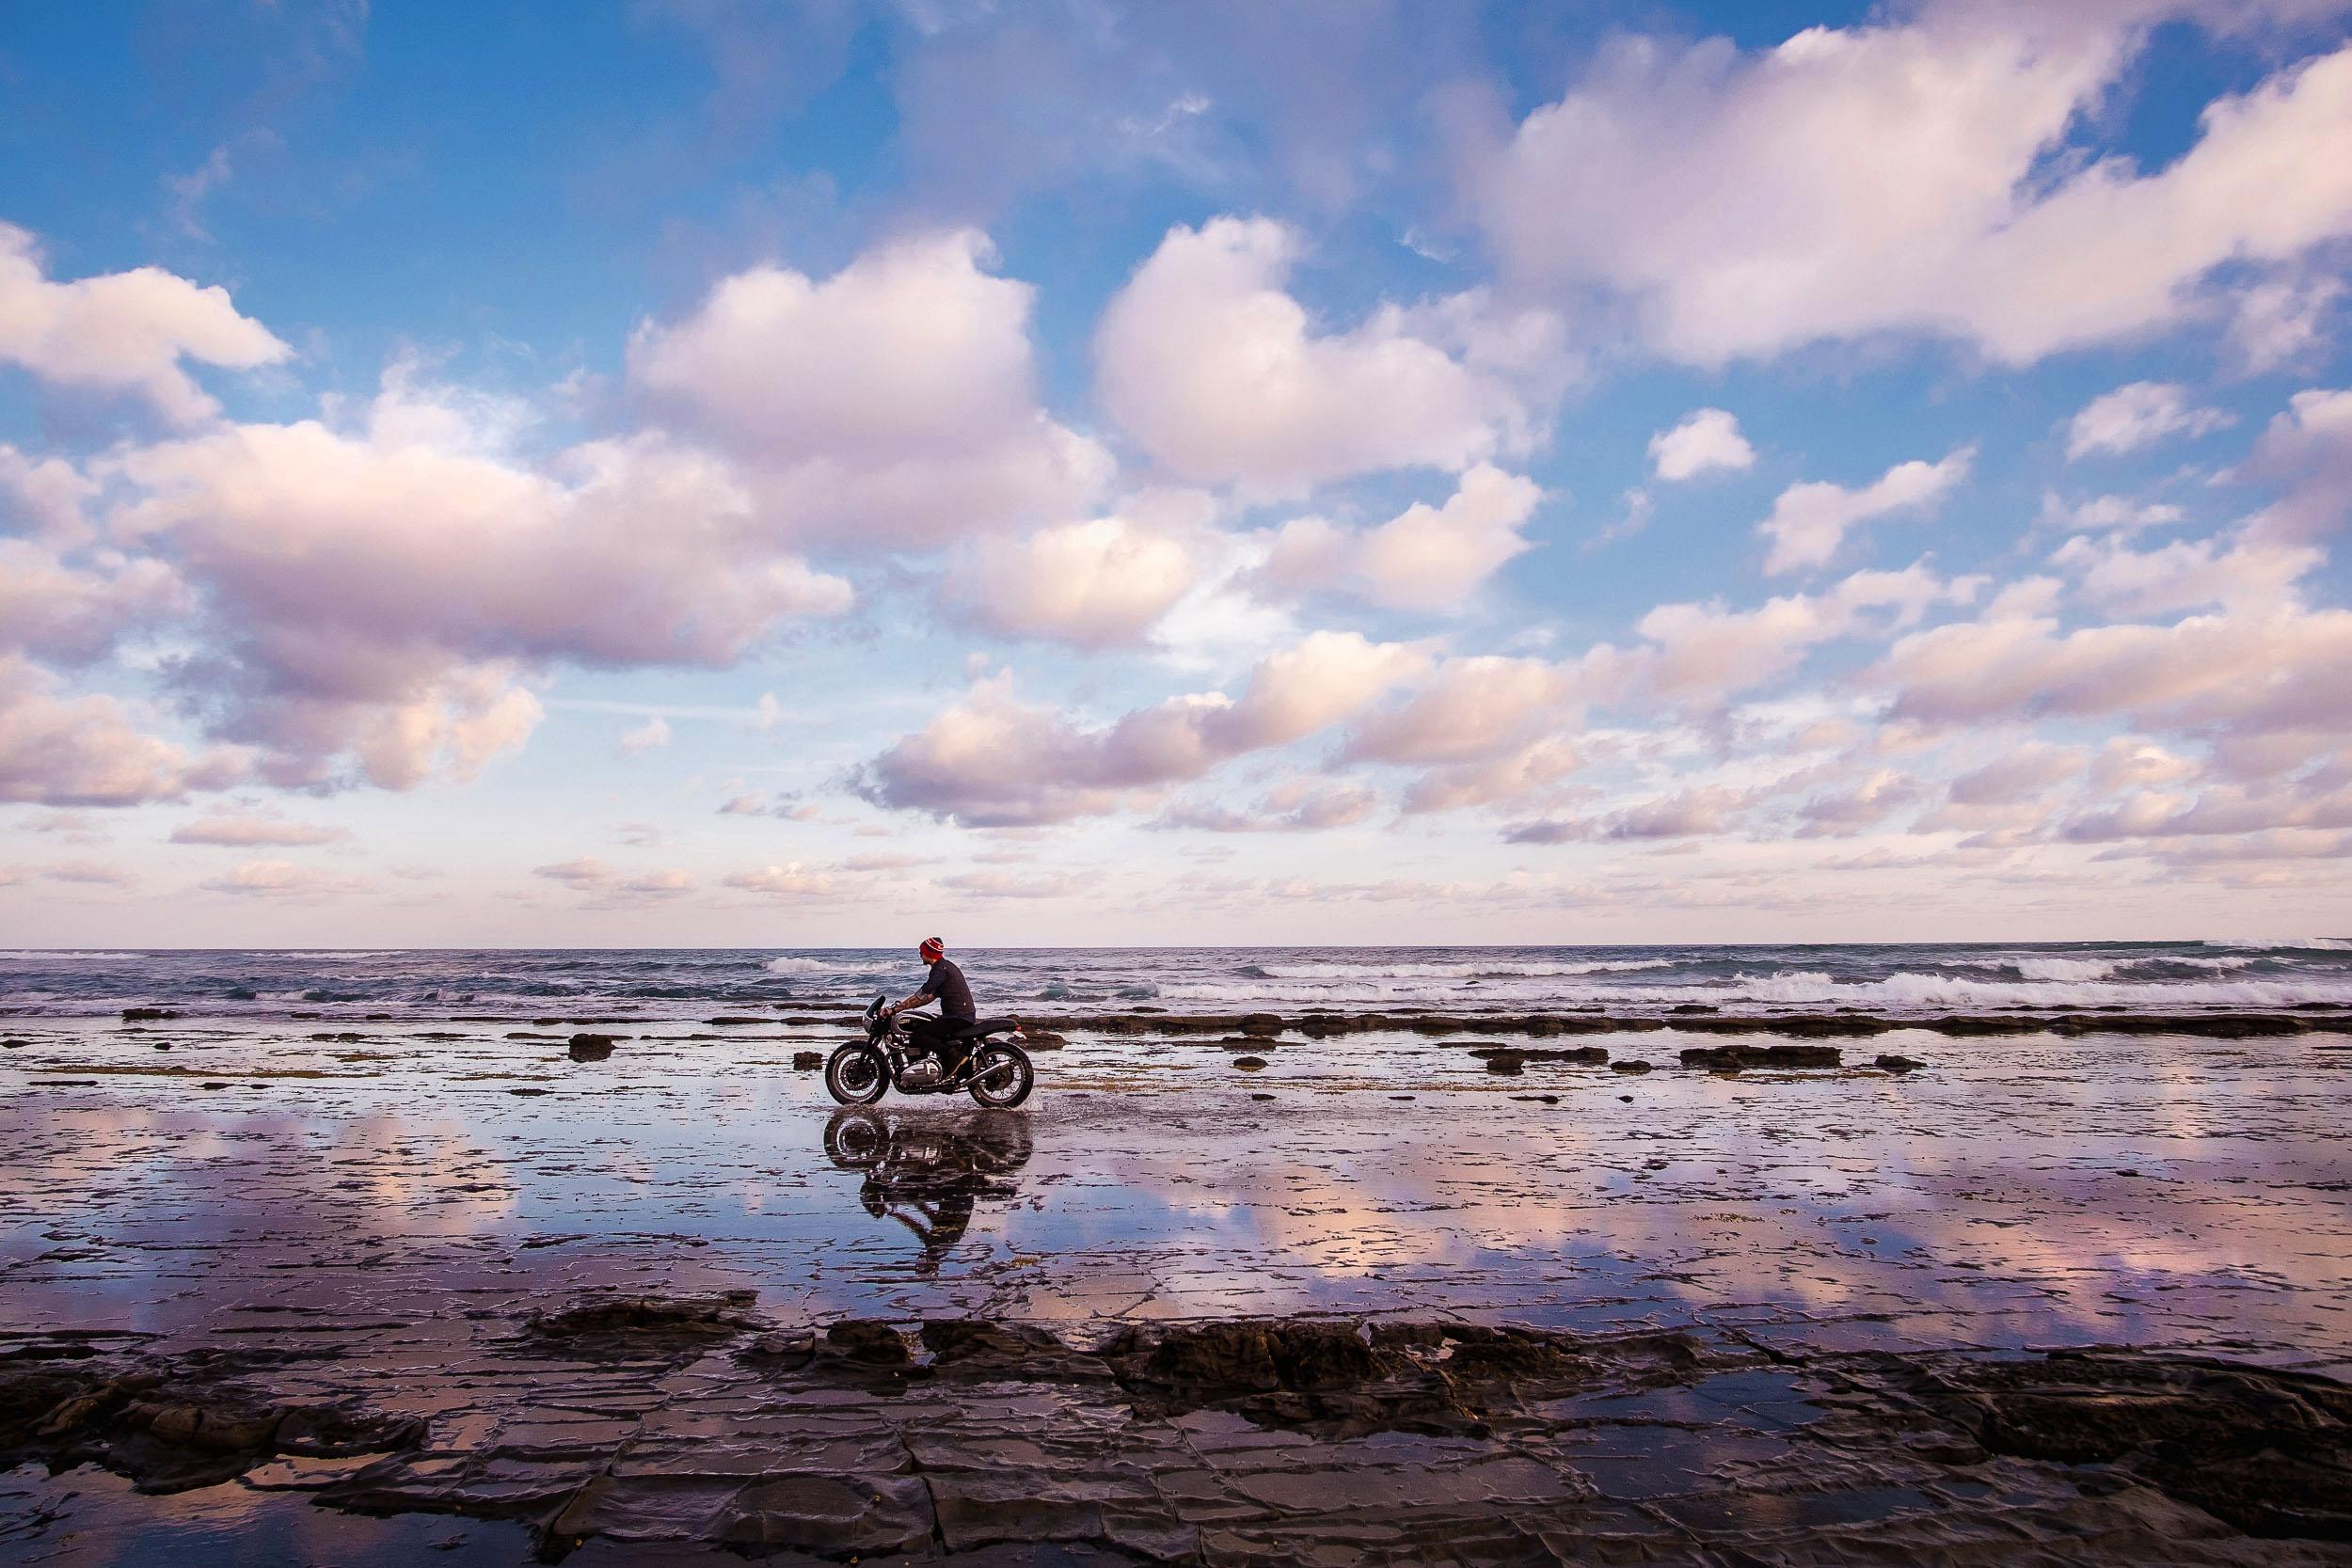 A motorcycle rider on an Aussie beach at dusk